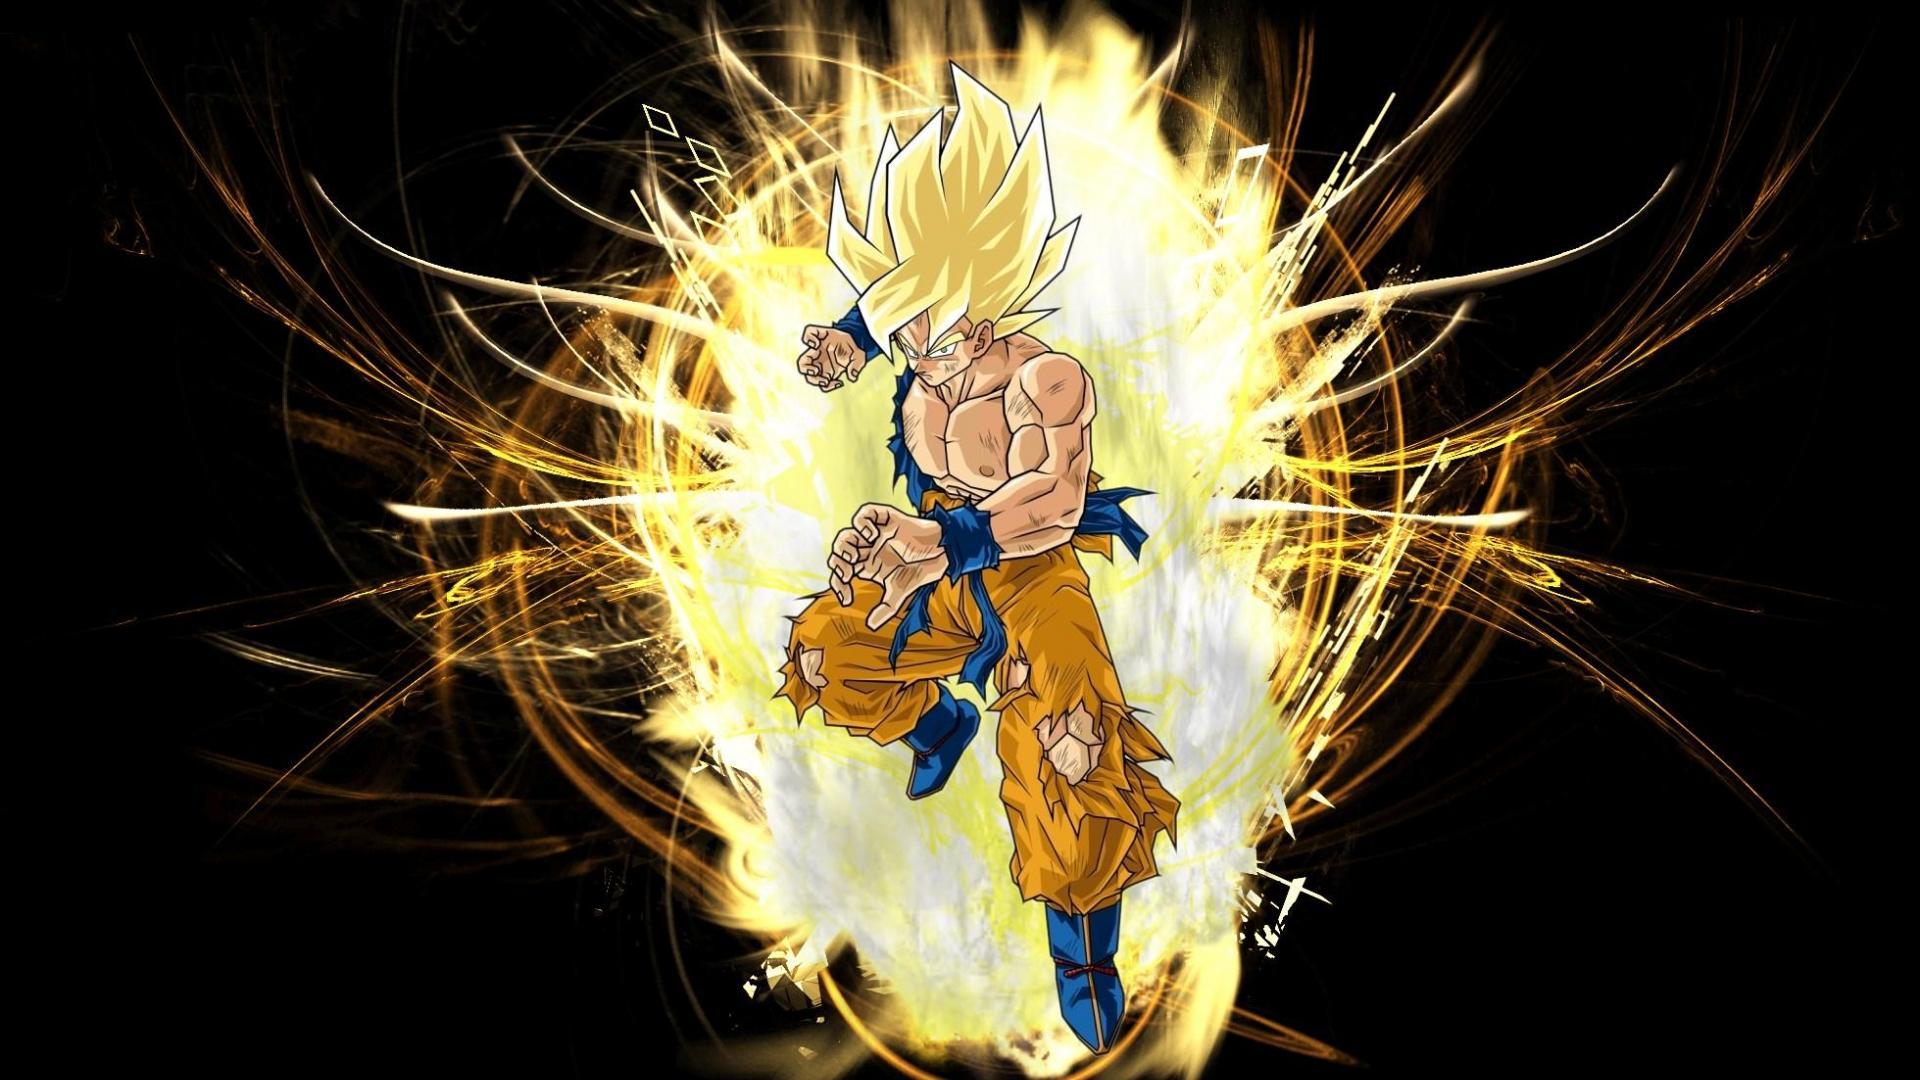 Dragon Ball Z Goku Super Hd Wallpaper